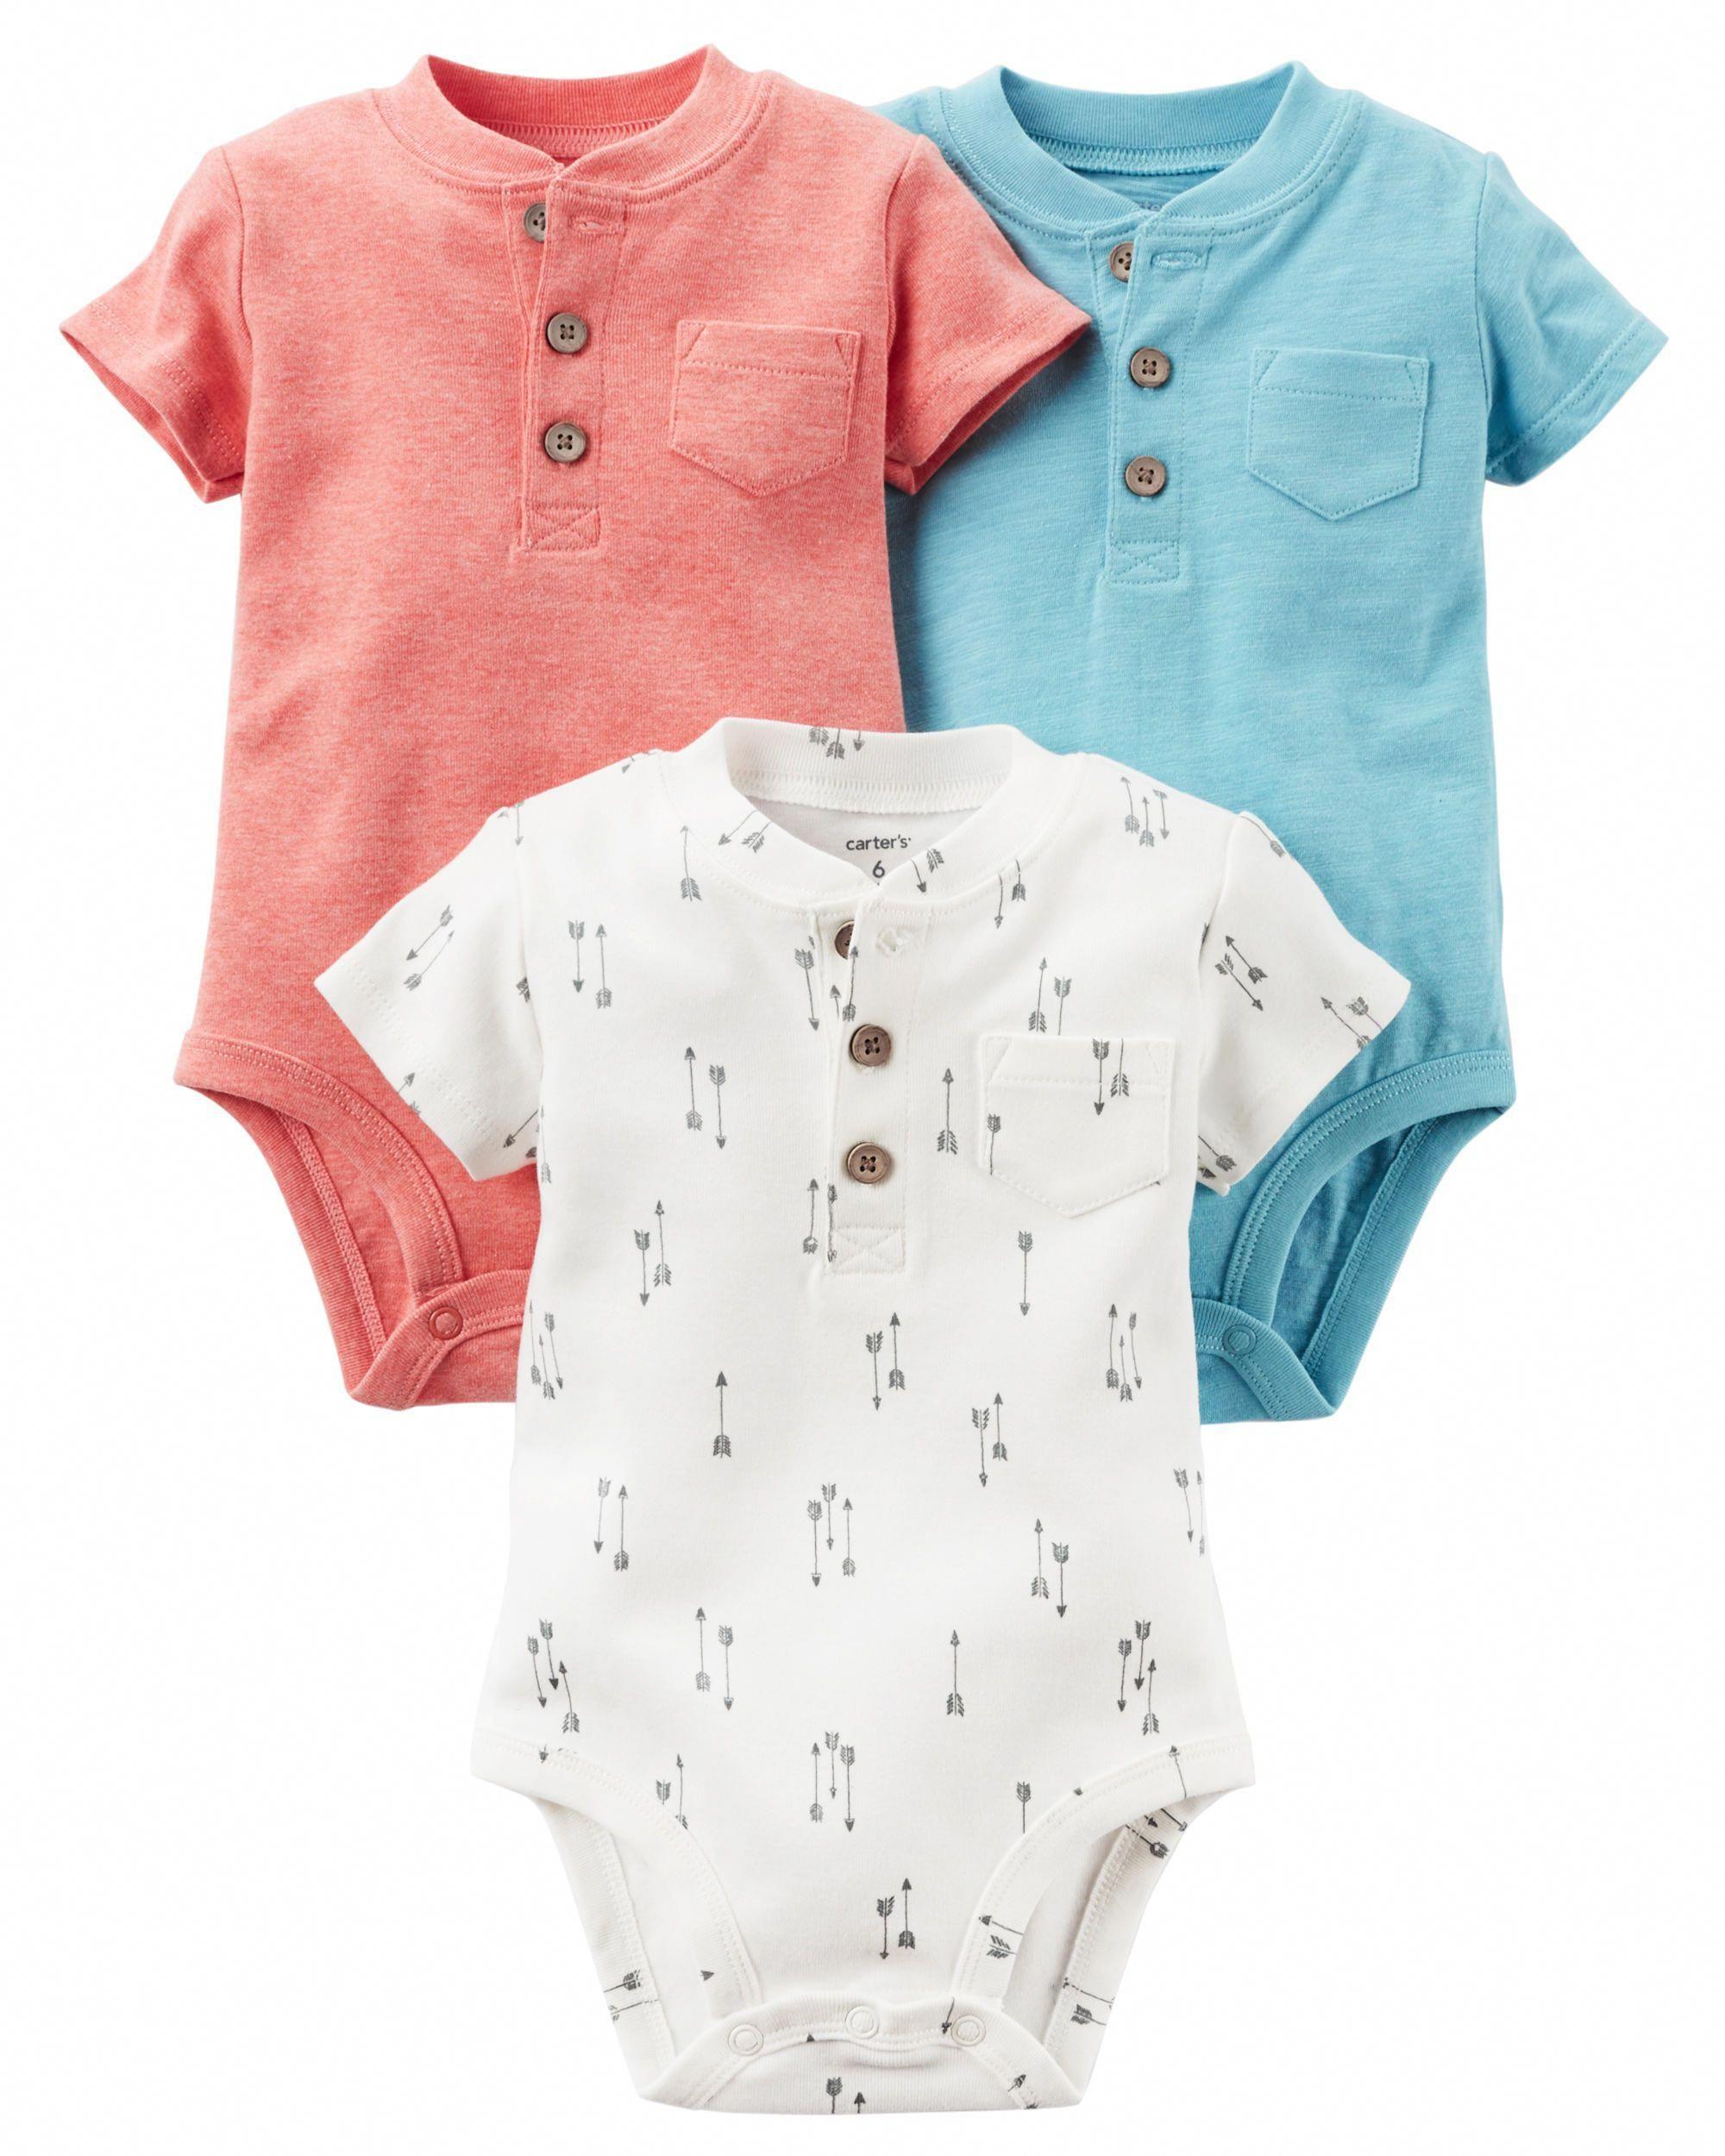 0402a76f1 Cheap Kids Clothing Online ID:9043965367 #KidsShoesForCheap | Kids ...